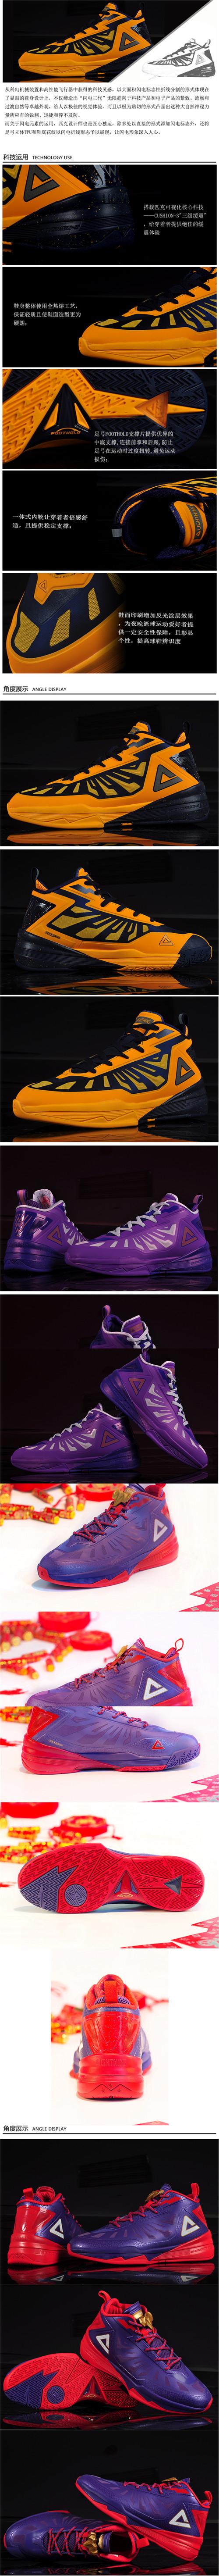 Peak Team Lightning 3 III Professional Basketball Shoes